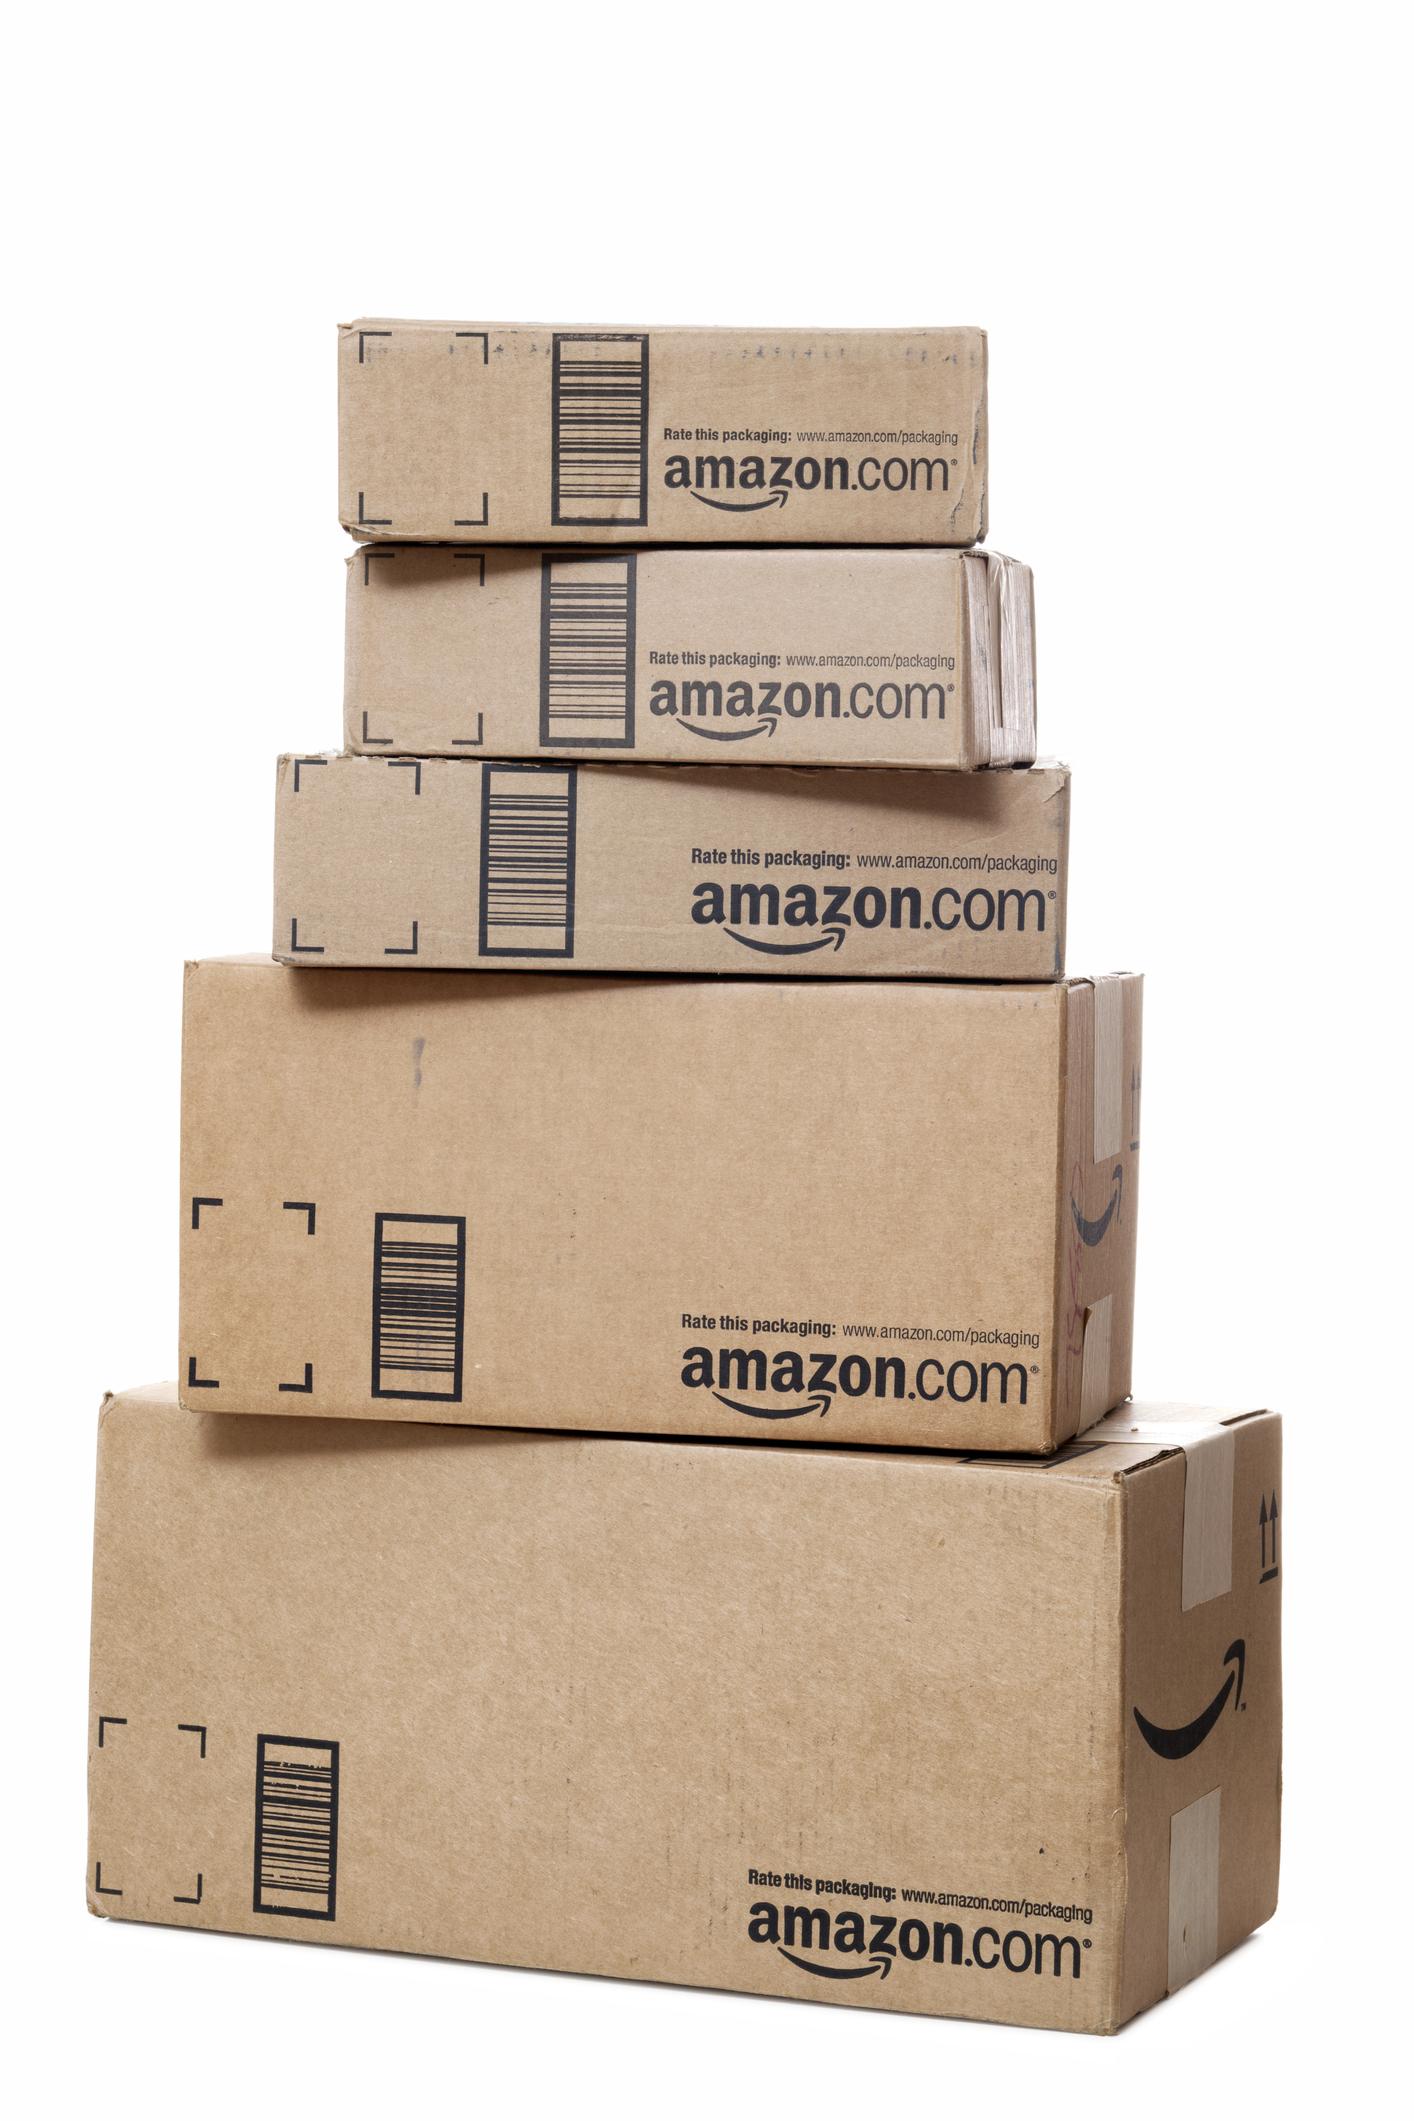 Amazon_Boxes.jpeg